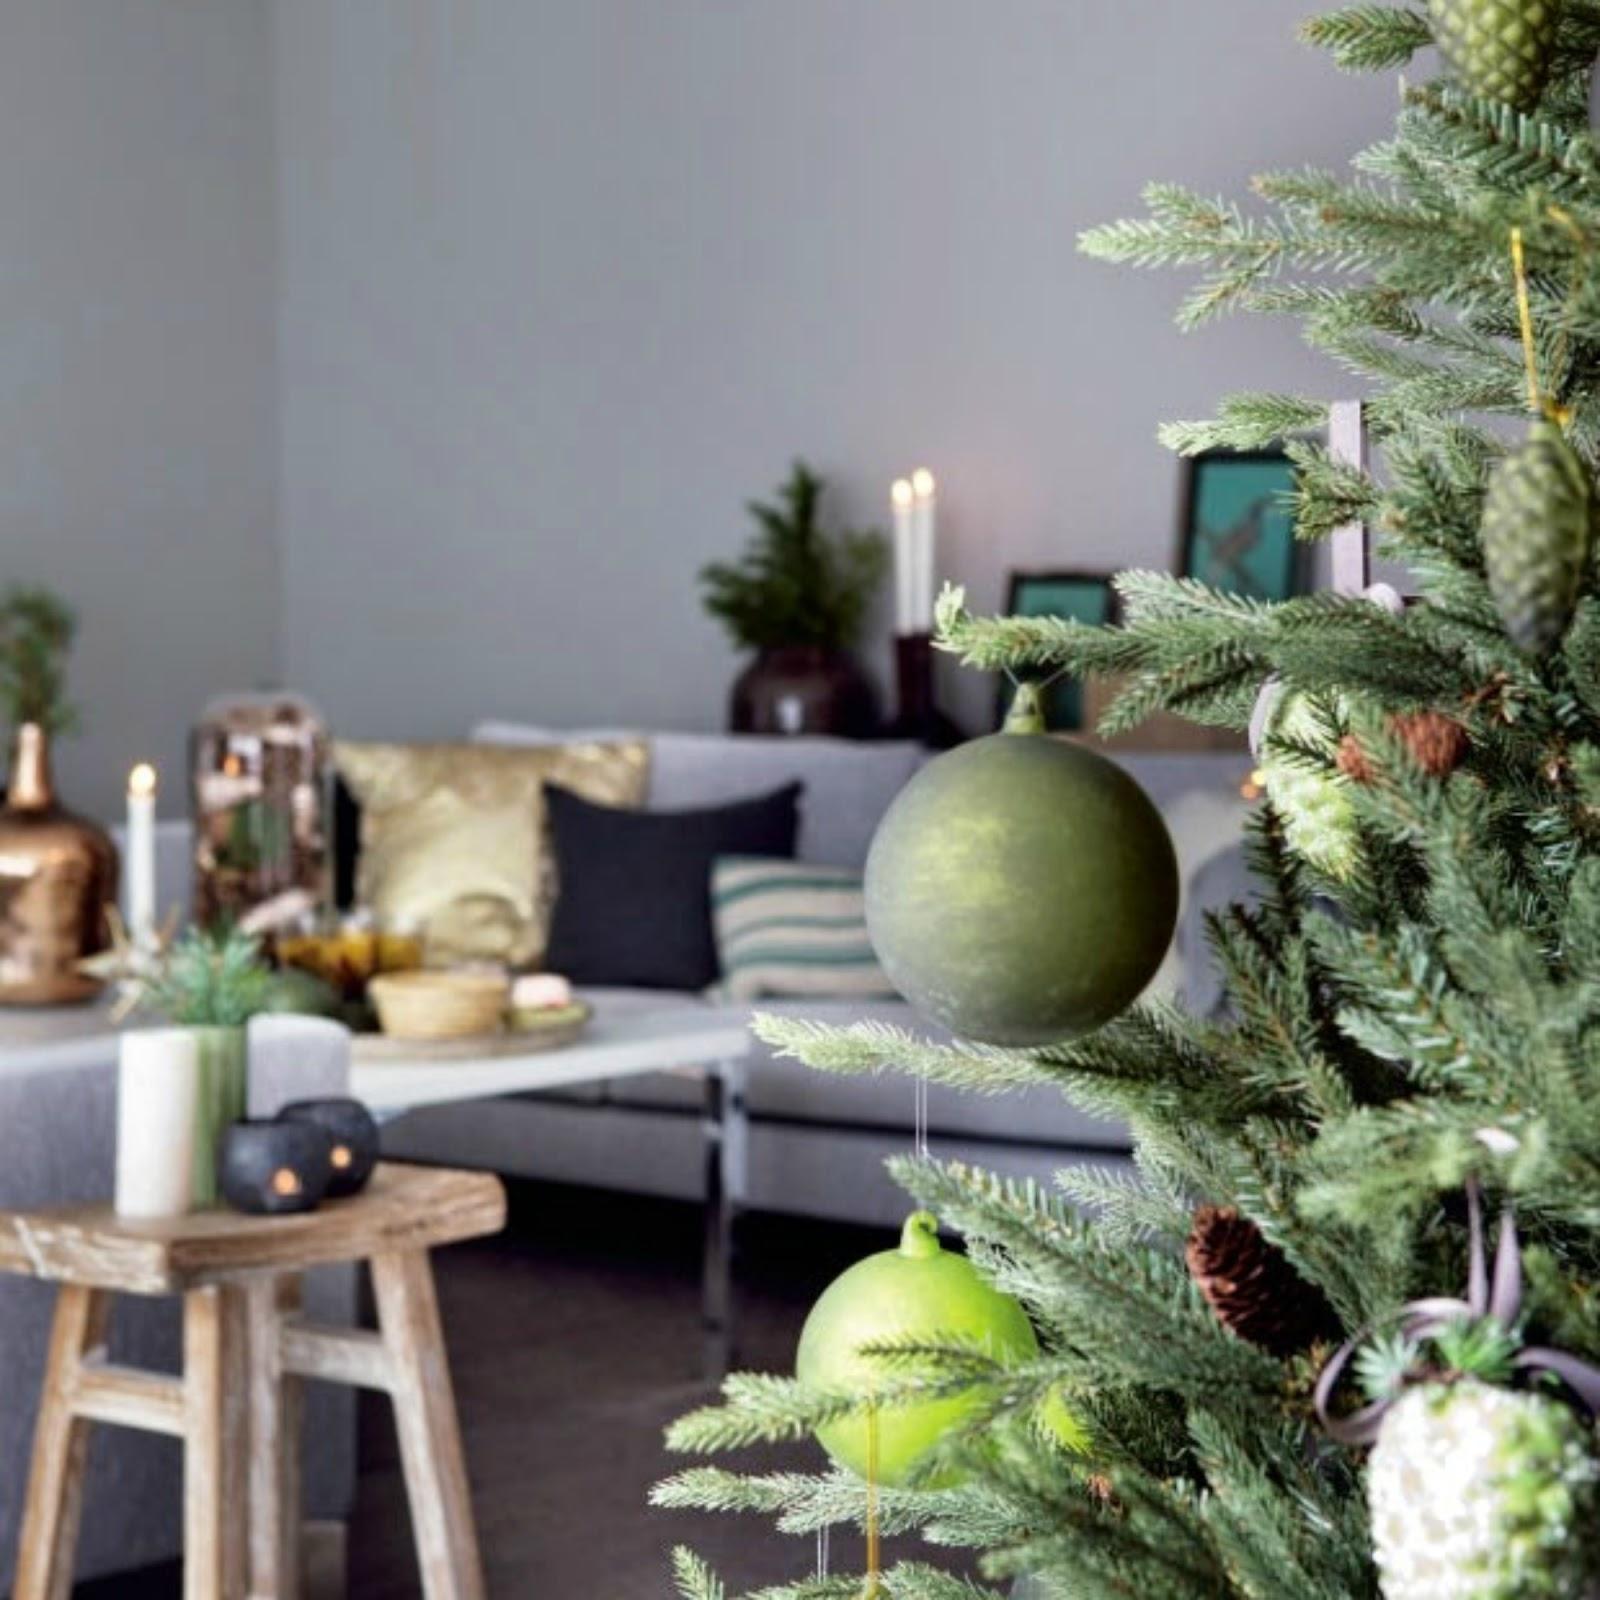 Decoraci n f cil decoraci n n rdica de navidad en verde for Decoracion 31 de diciembre